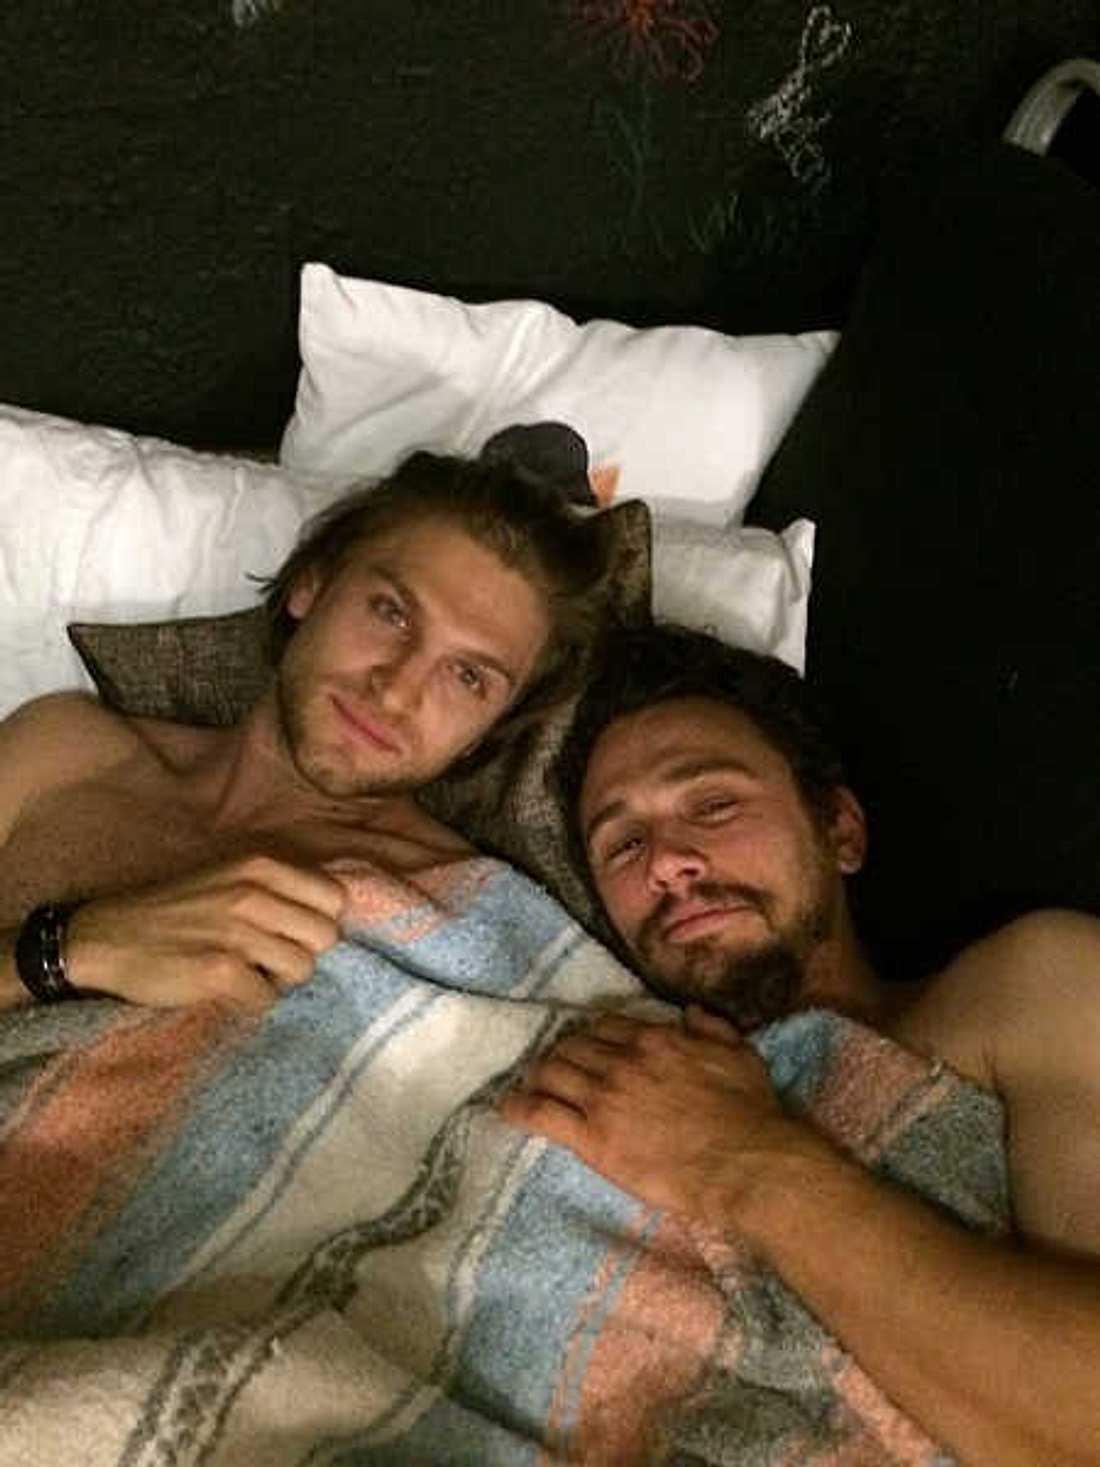 James Franco im Bett mit Keegan Allen!